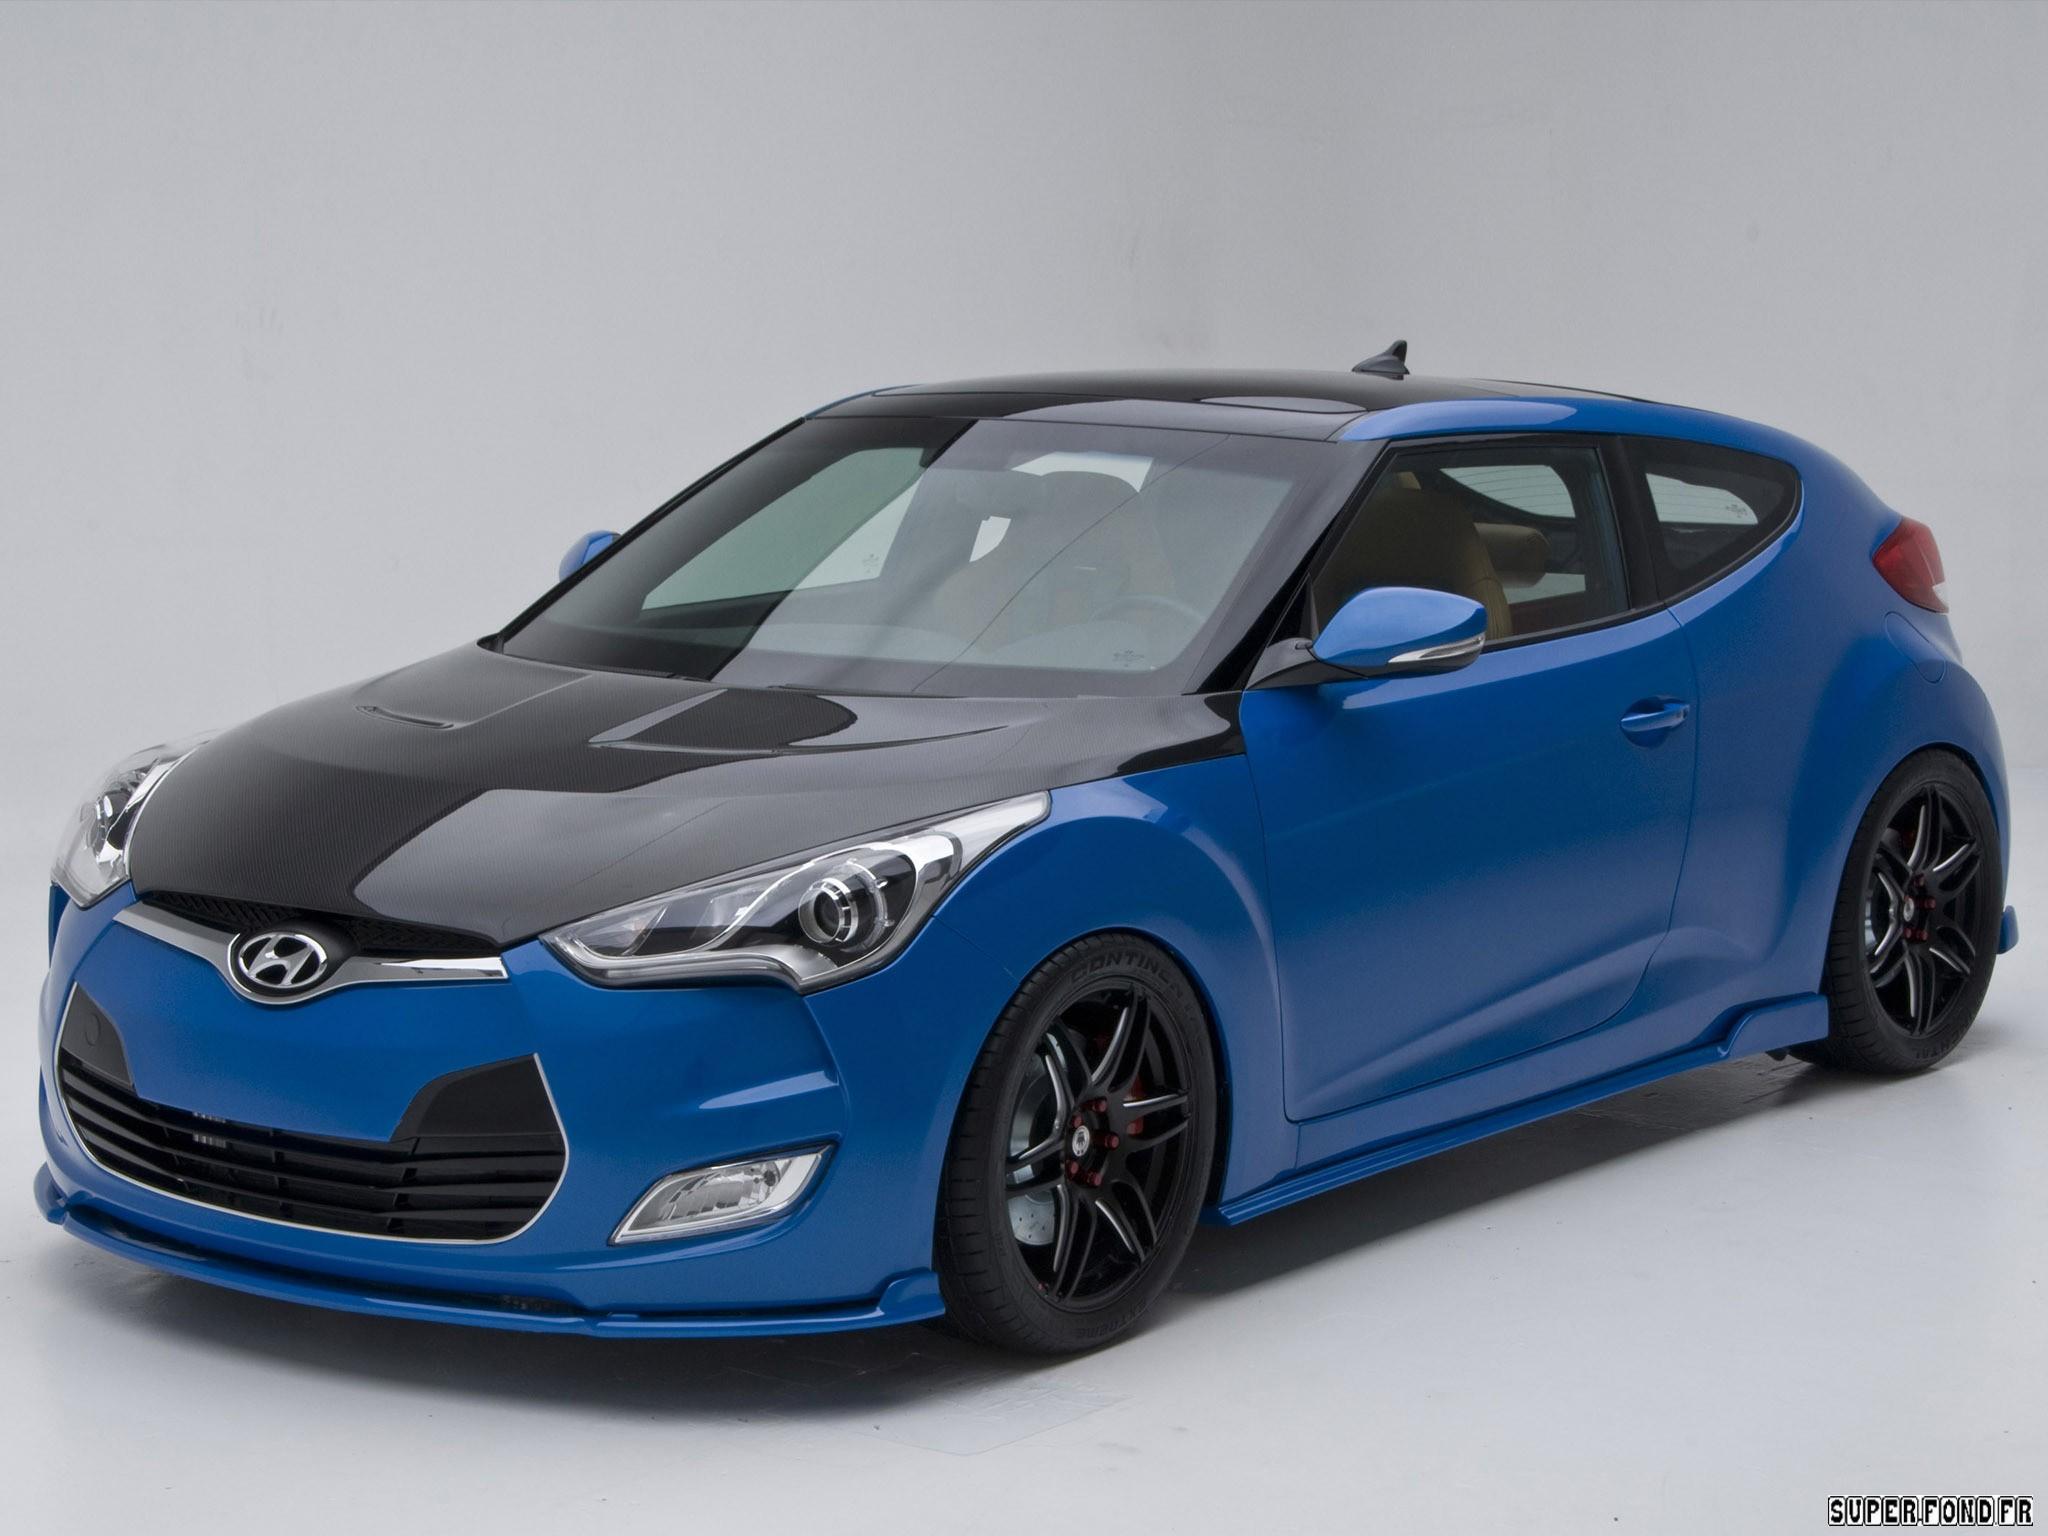 2011 Hyundai Veloster PM Lifestyle